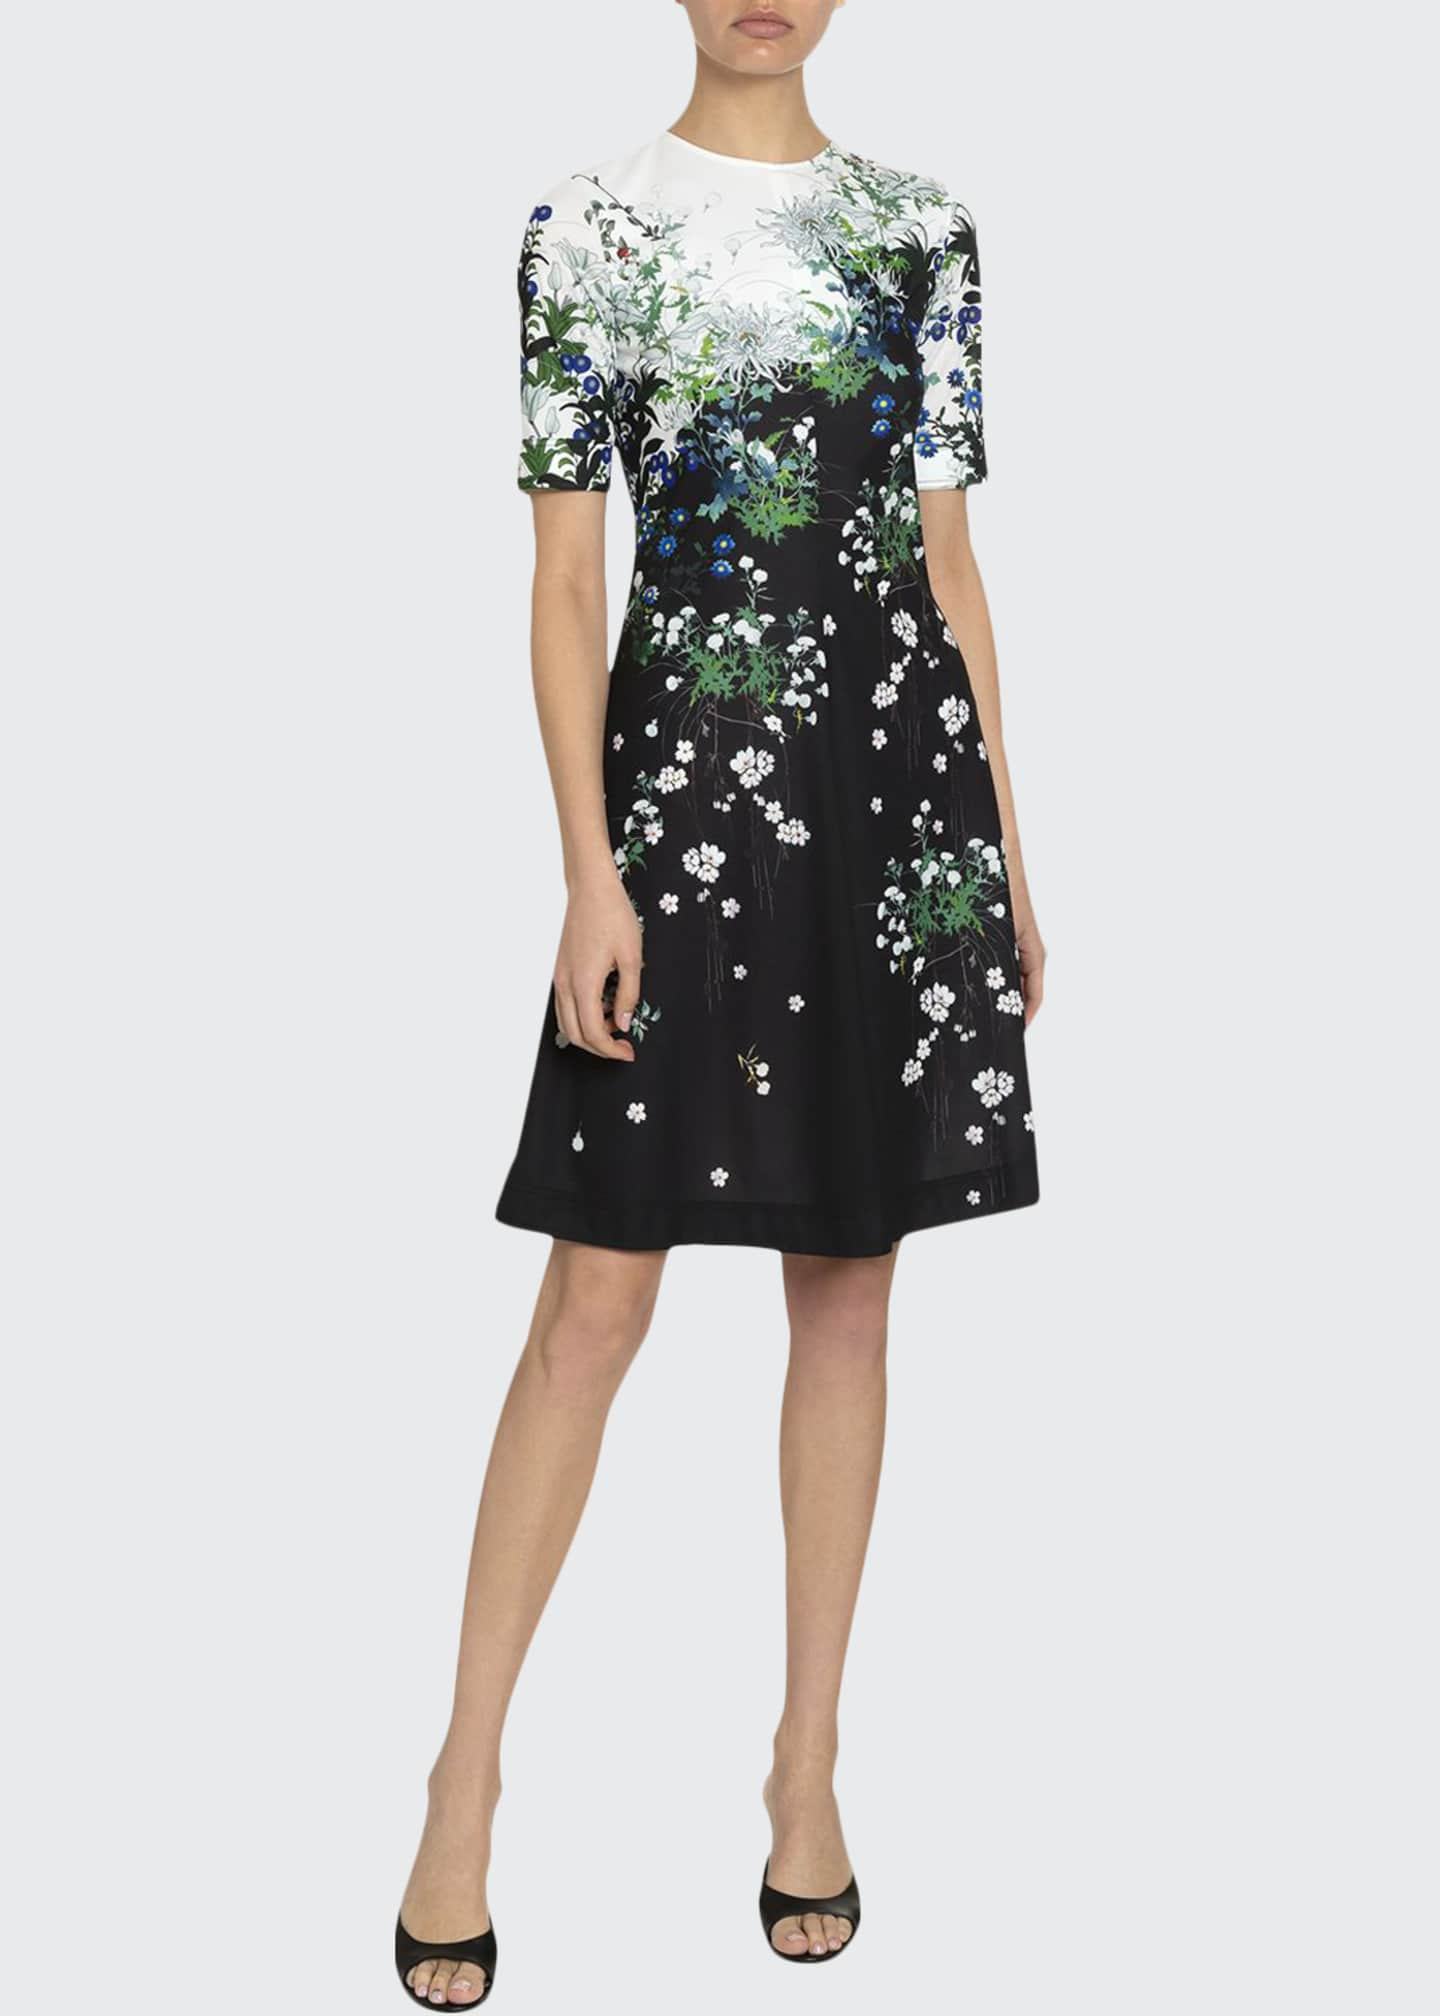 Givenchy Floral Crewneck Knee-Length Dress